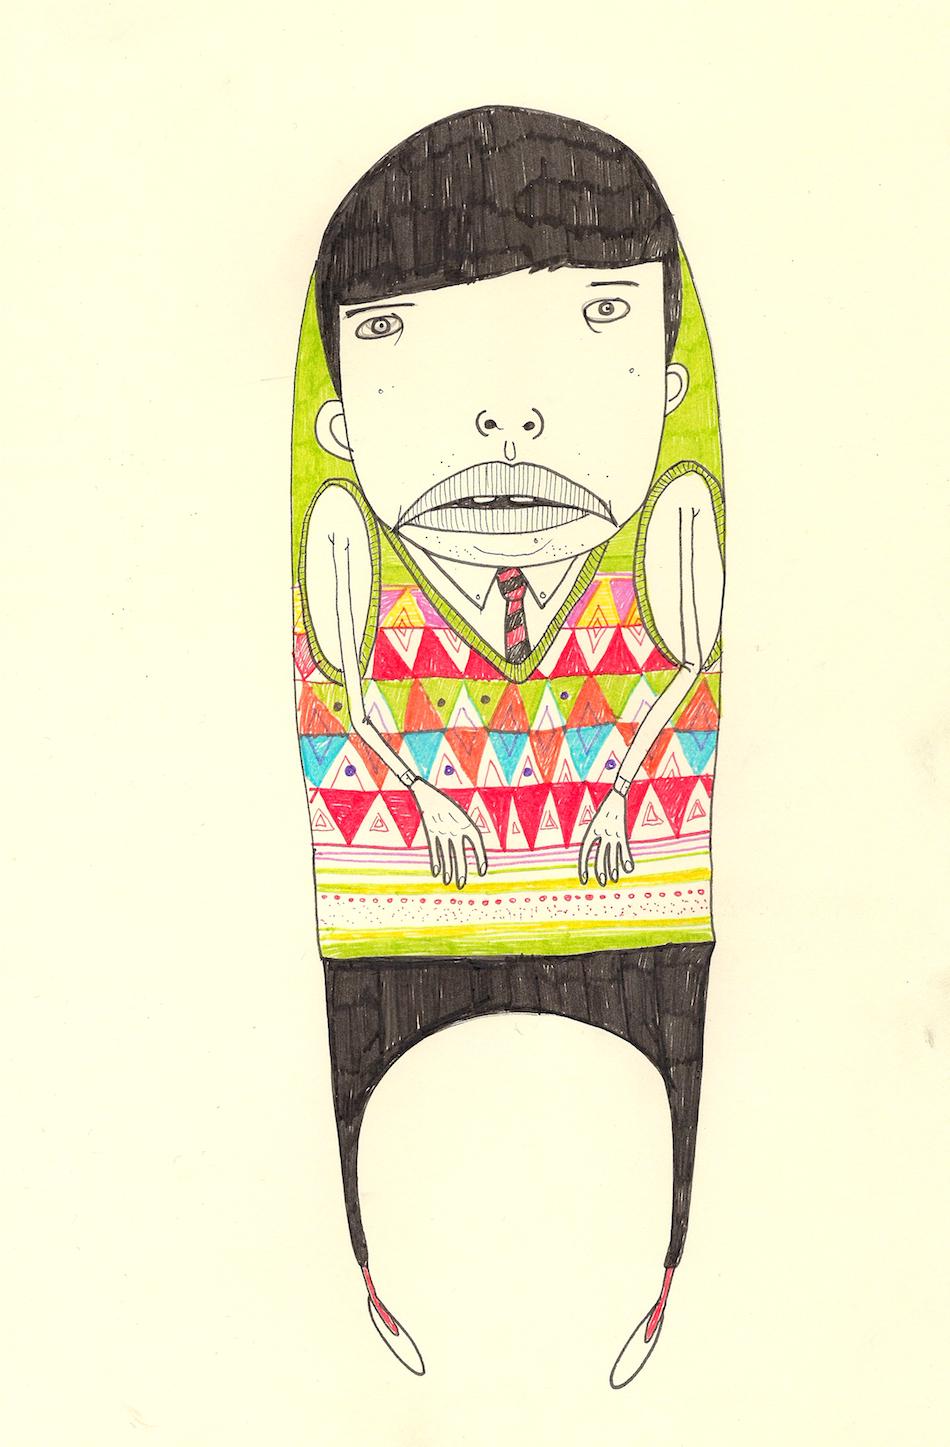 """Jack Henry and His Colorful Knitted Vest"",Felt Tip Pens,8x11, $650 (framed)"